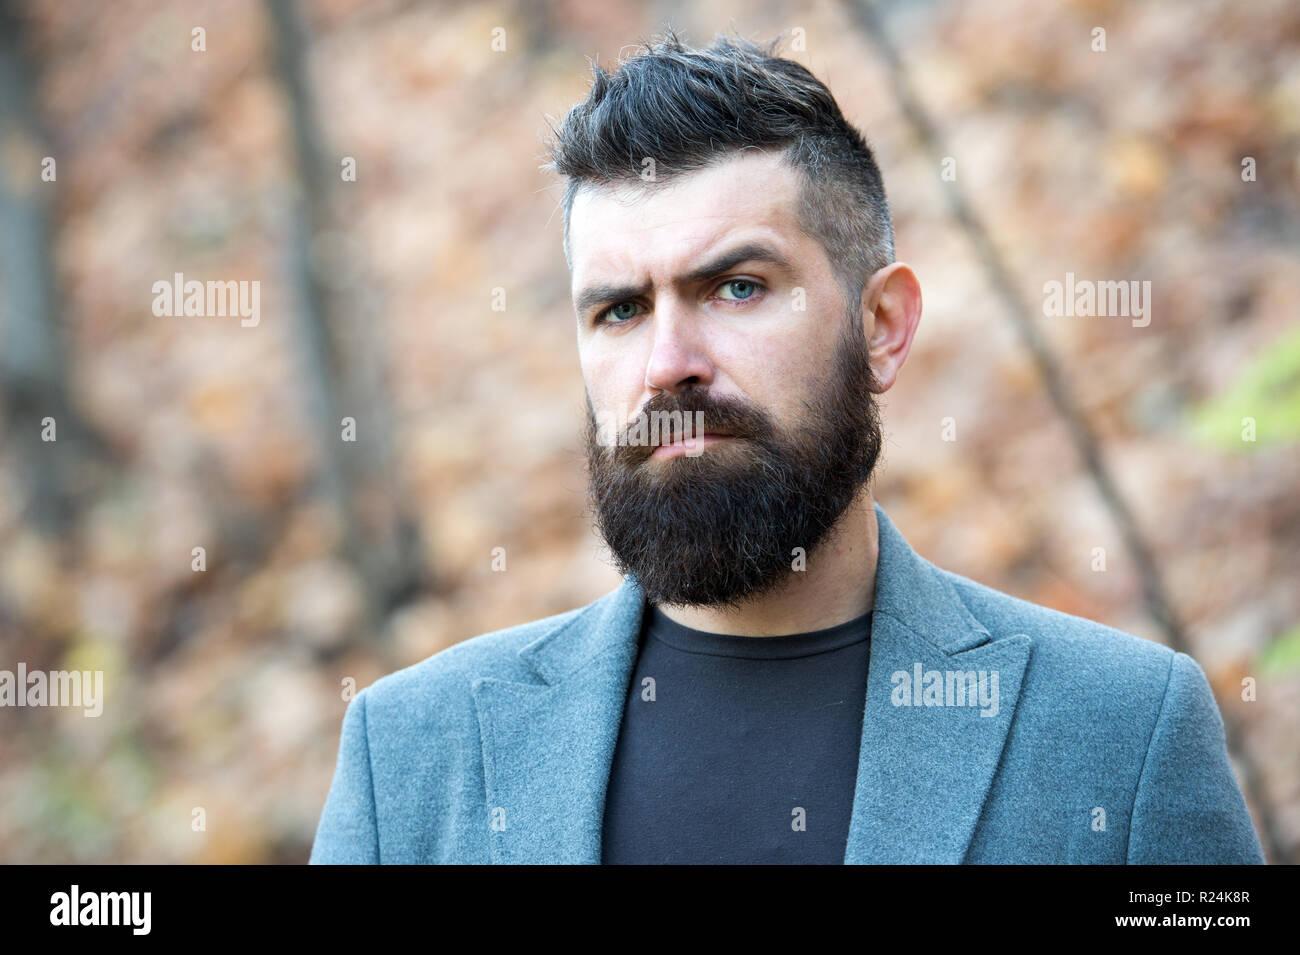 460cf0c6017 Man bearded hipster stylish fashionable coat. Stylish beard and mustache  fall and